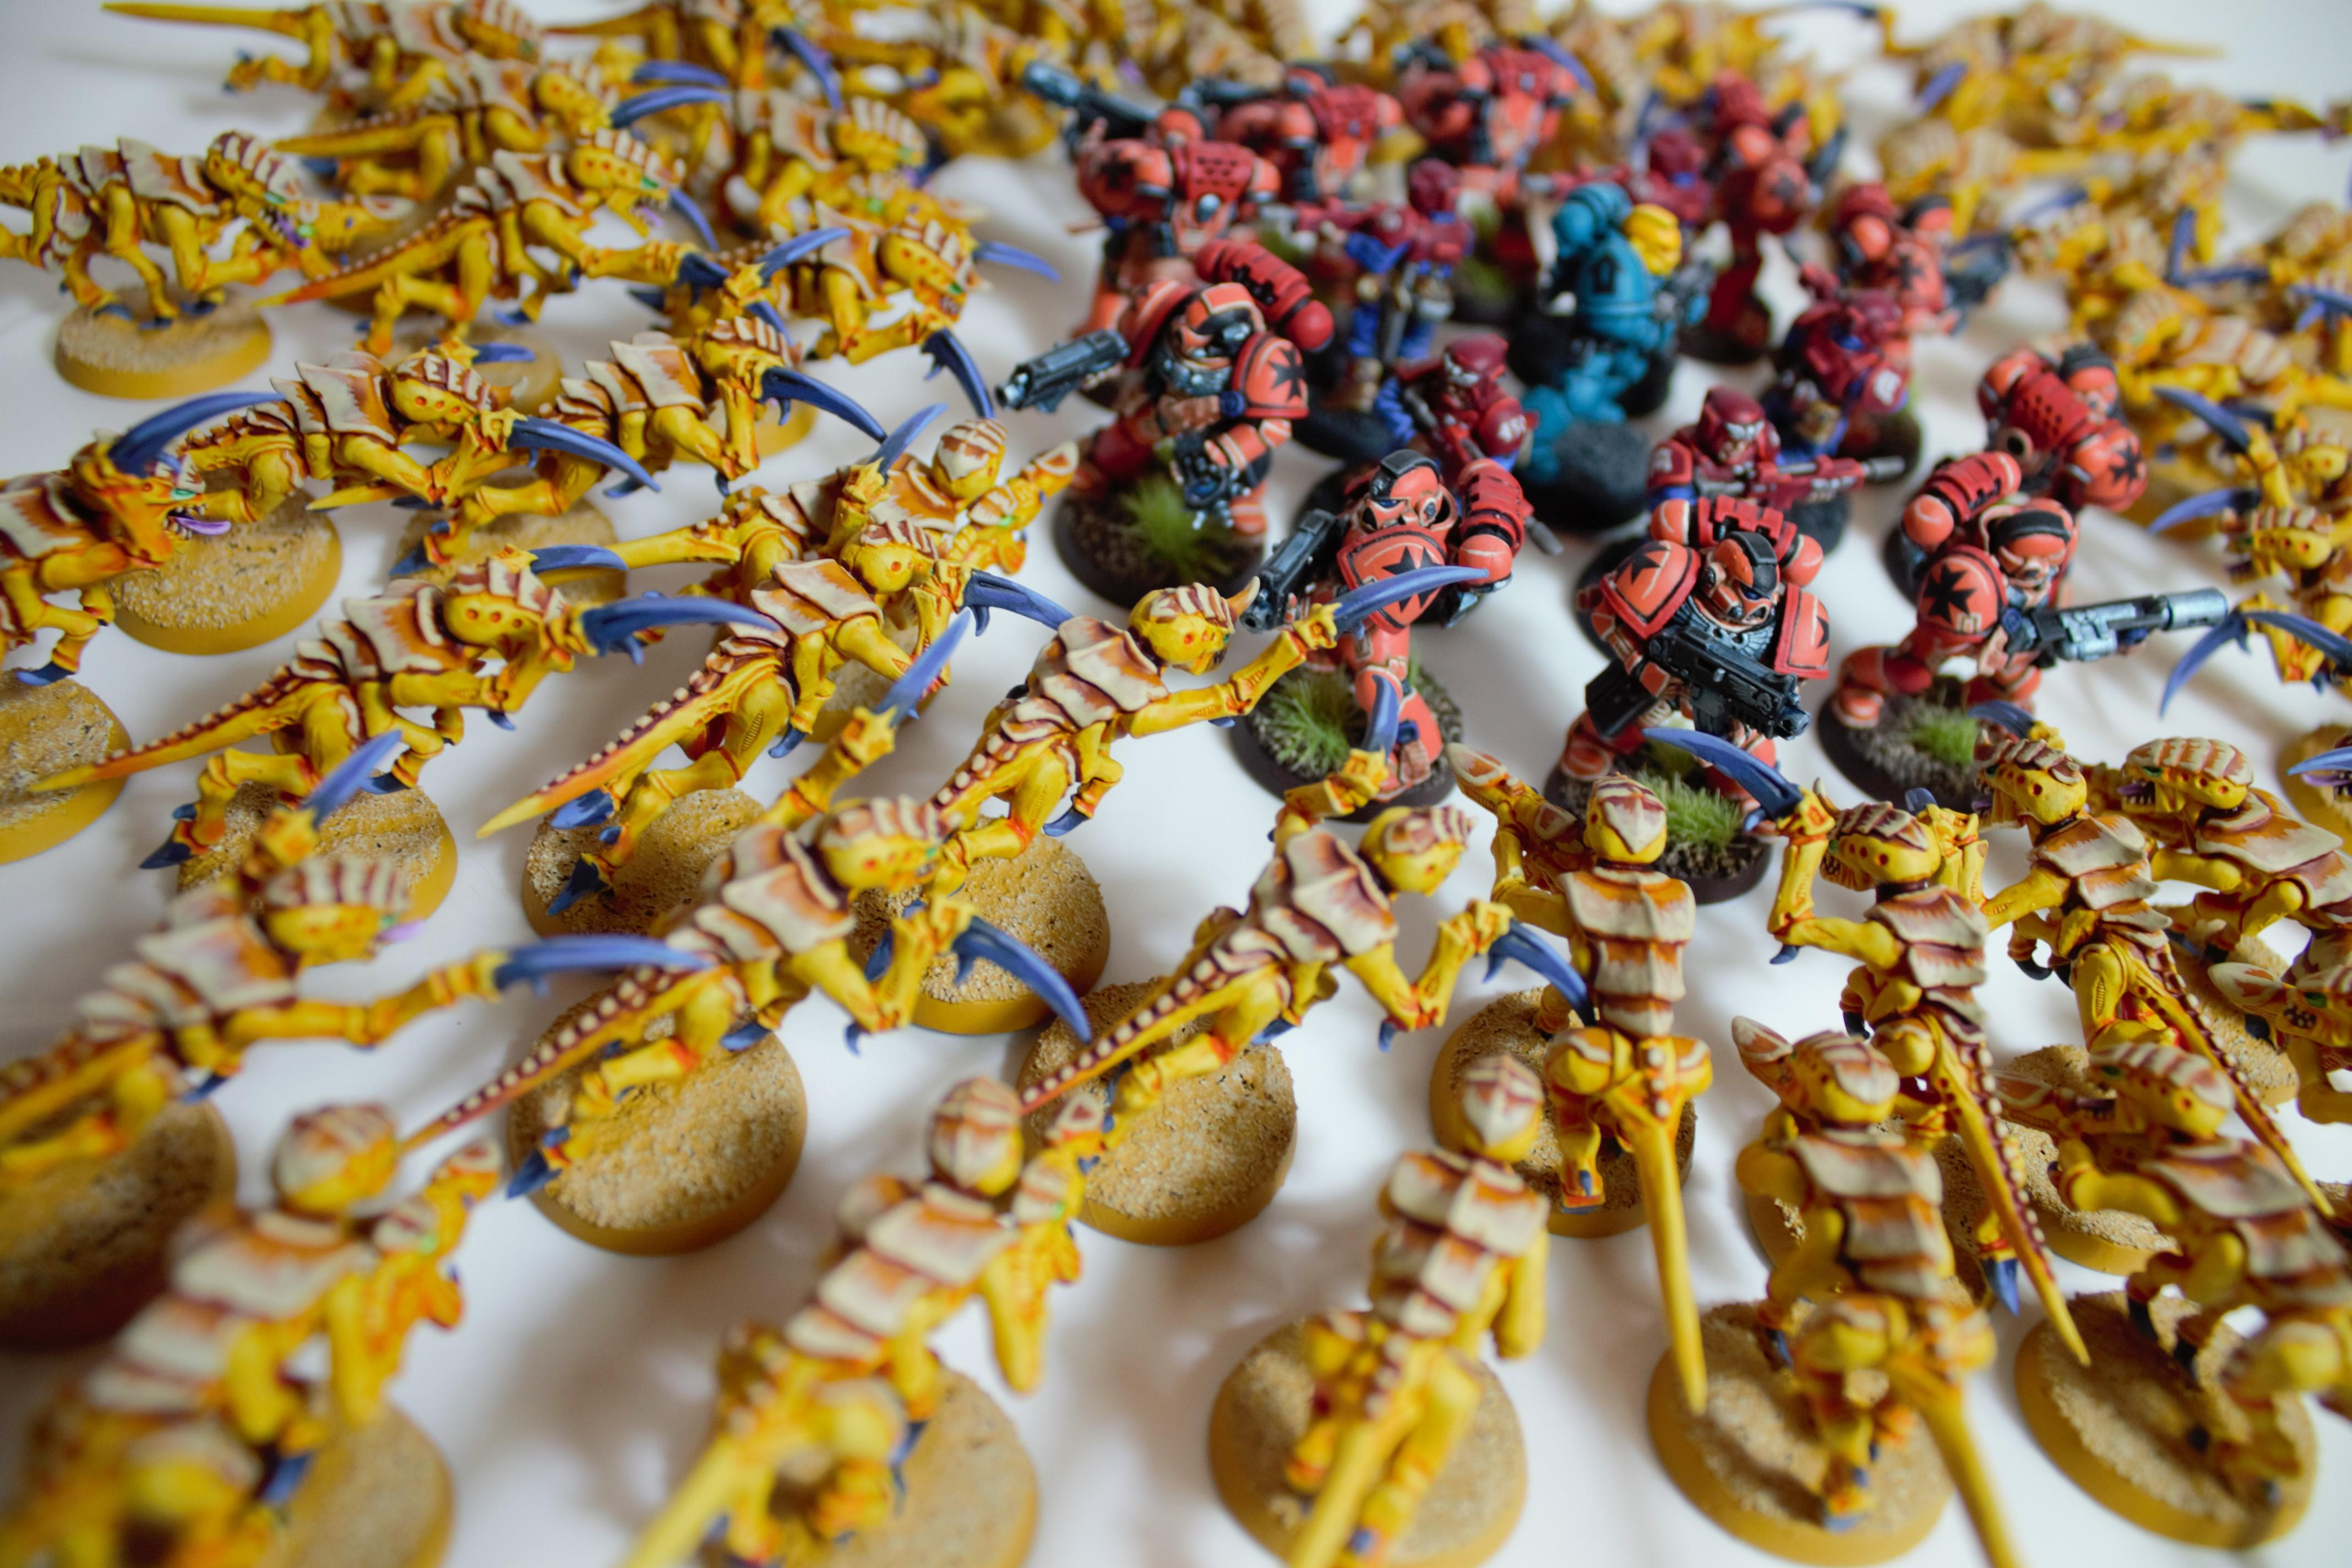 Astra Militarum, Last Stand, Space Marines, Tyranids, Warhammer 40,000